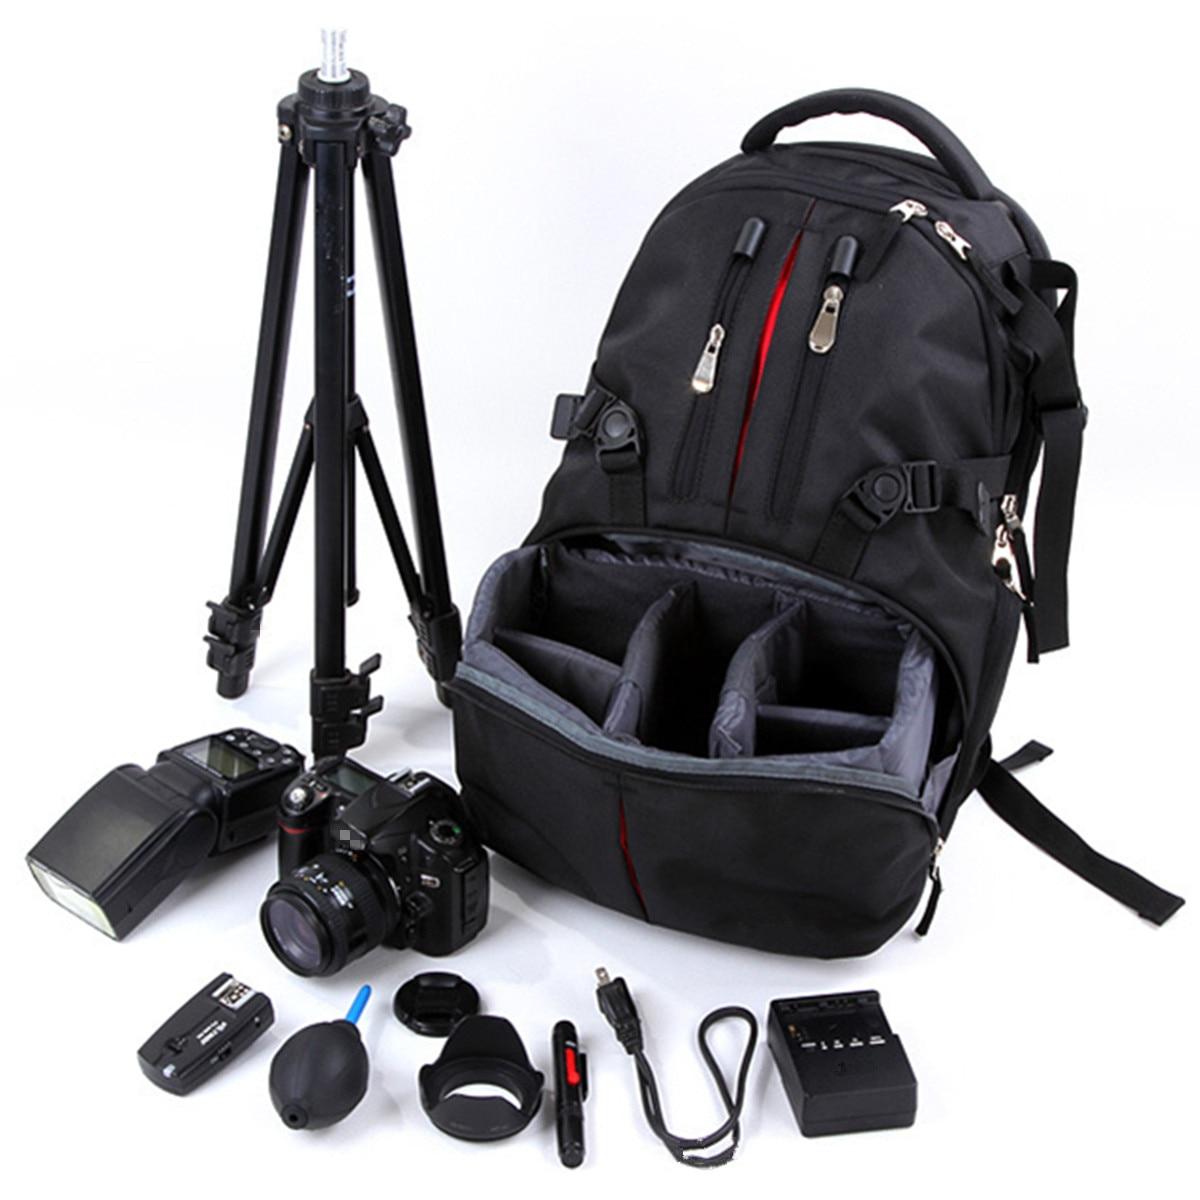 Waterproof DSLR Camera Backpack Case For Nikon For Canon Photo Bag for Camera &Outdoor Travel photographs Package Rucksack Bag